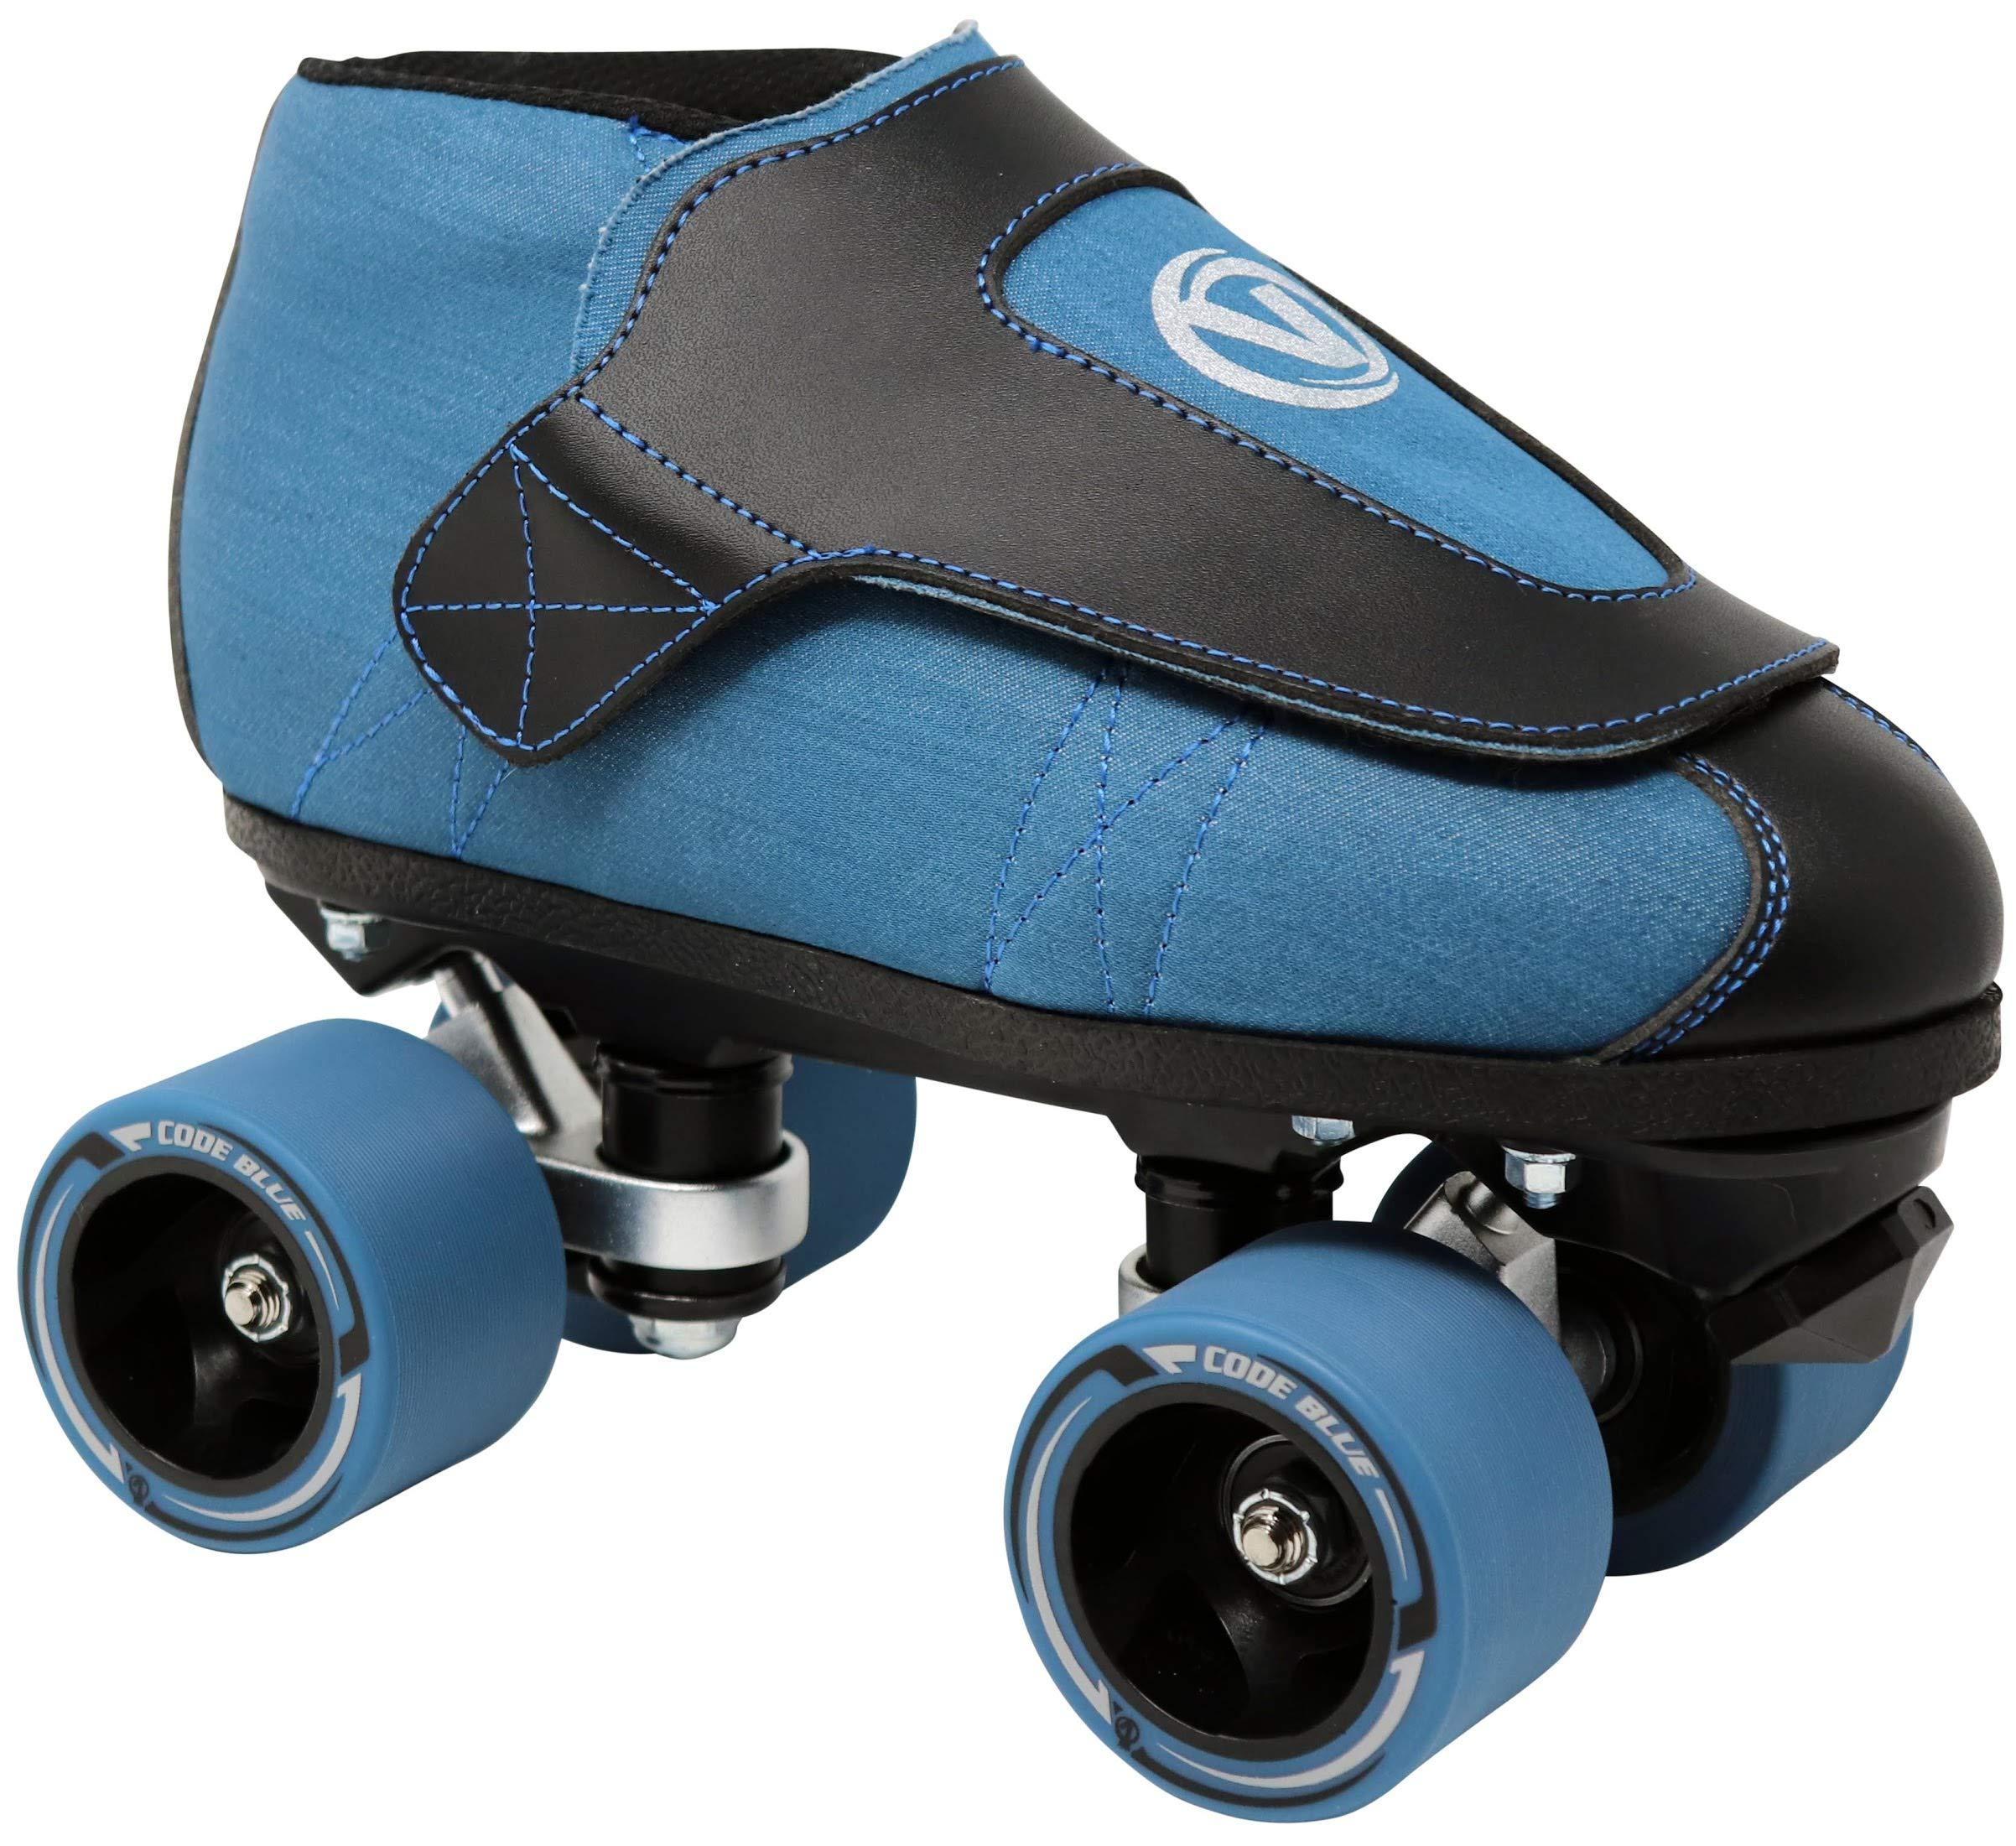 VNLA Code Blue Jam Skate - Mens & Womens Speed Skates - Quad Skates for Women & Men - Adjustable Roller Skate/Rollerskates - Outdoor & Indoor Adult Quad Skate - Kid/Kids Roller Skates (Size 6) by VNLA (Image #1)